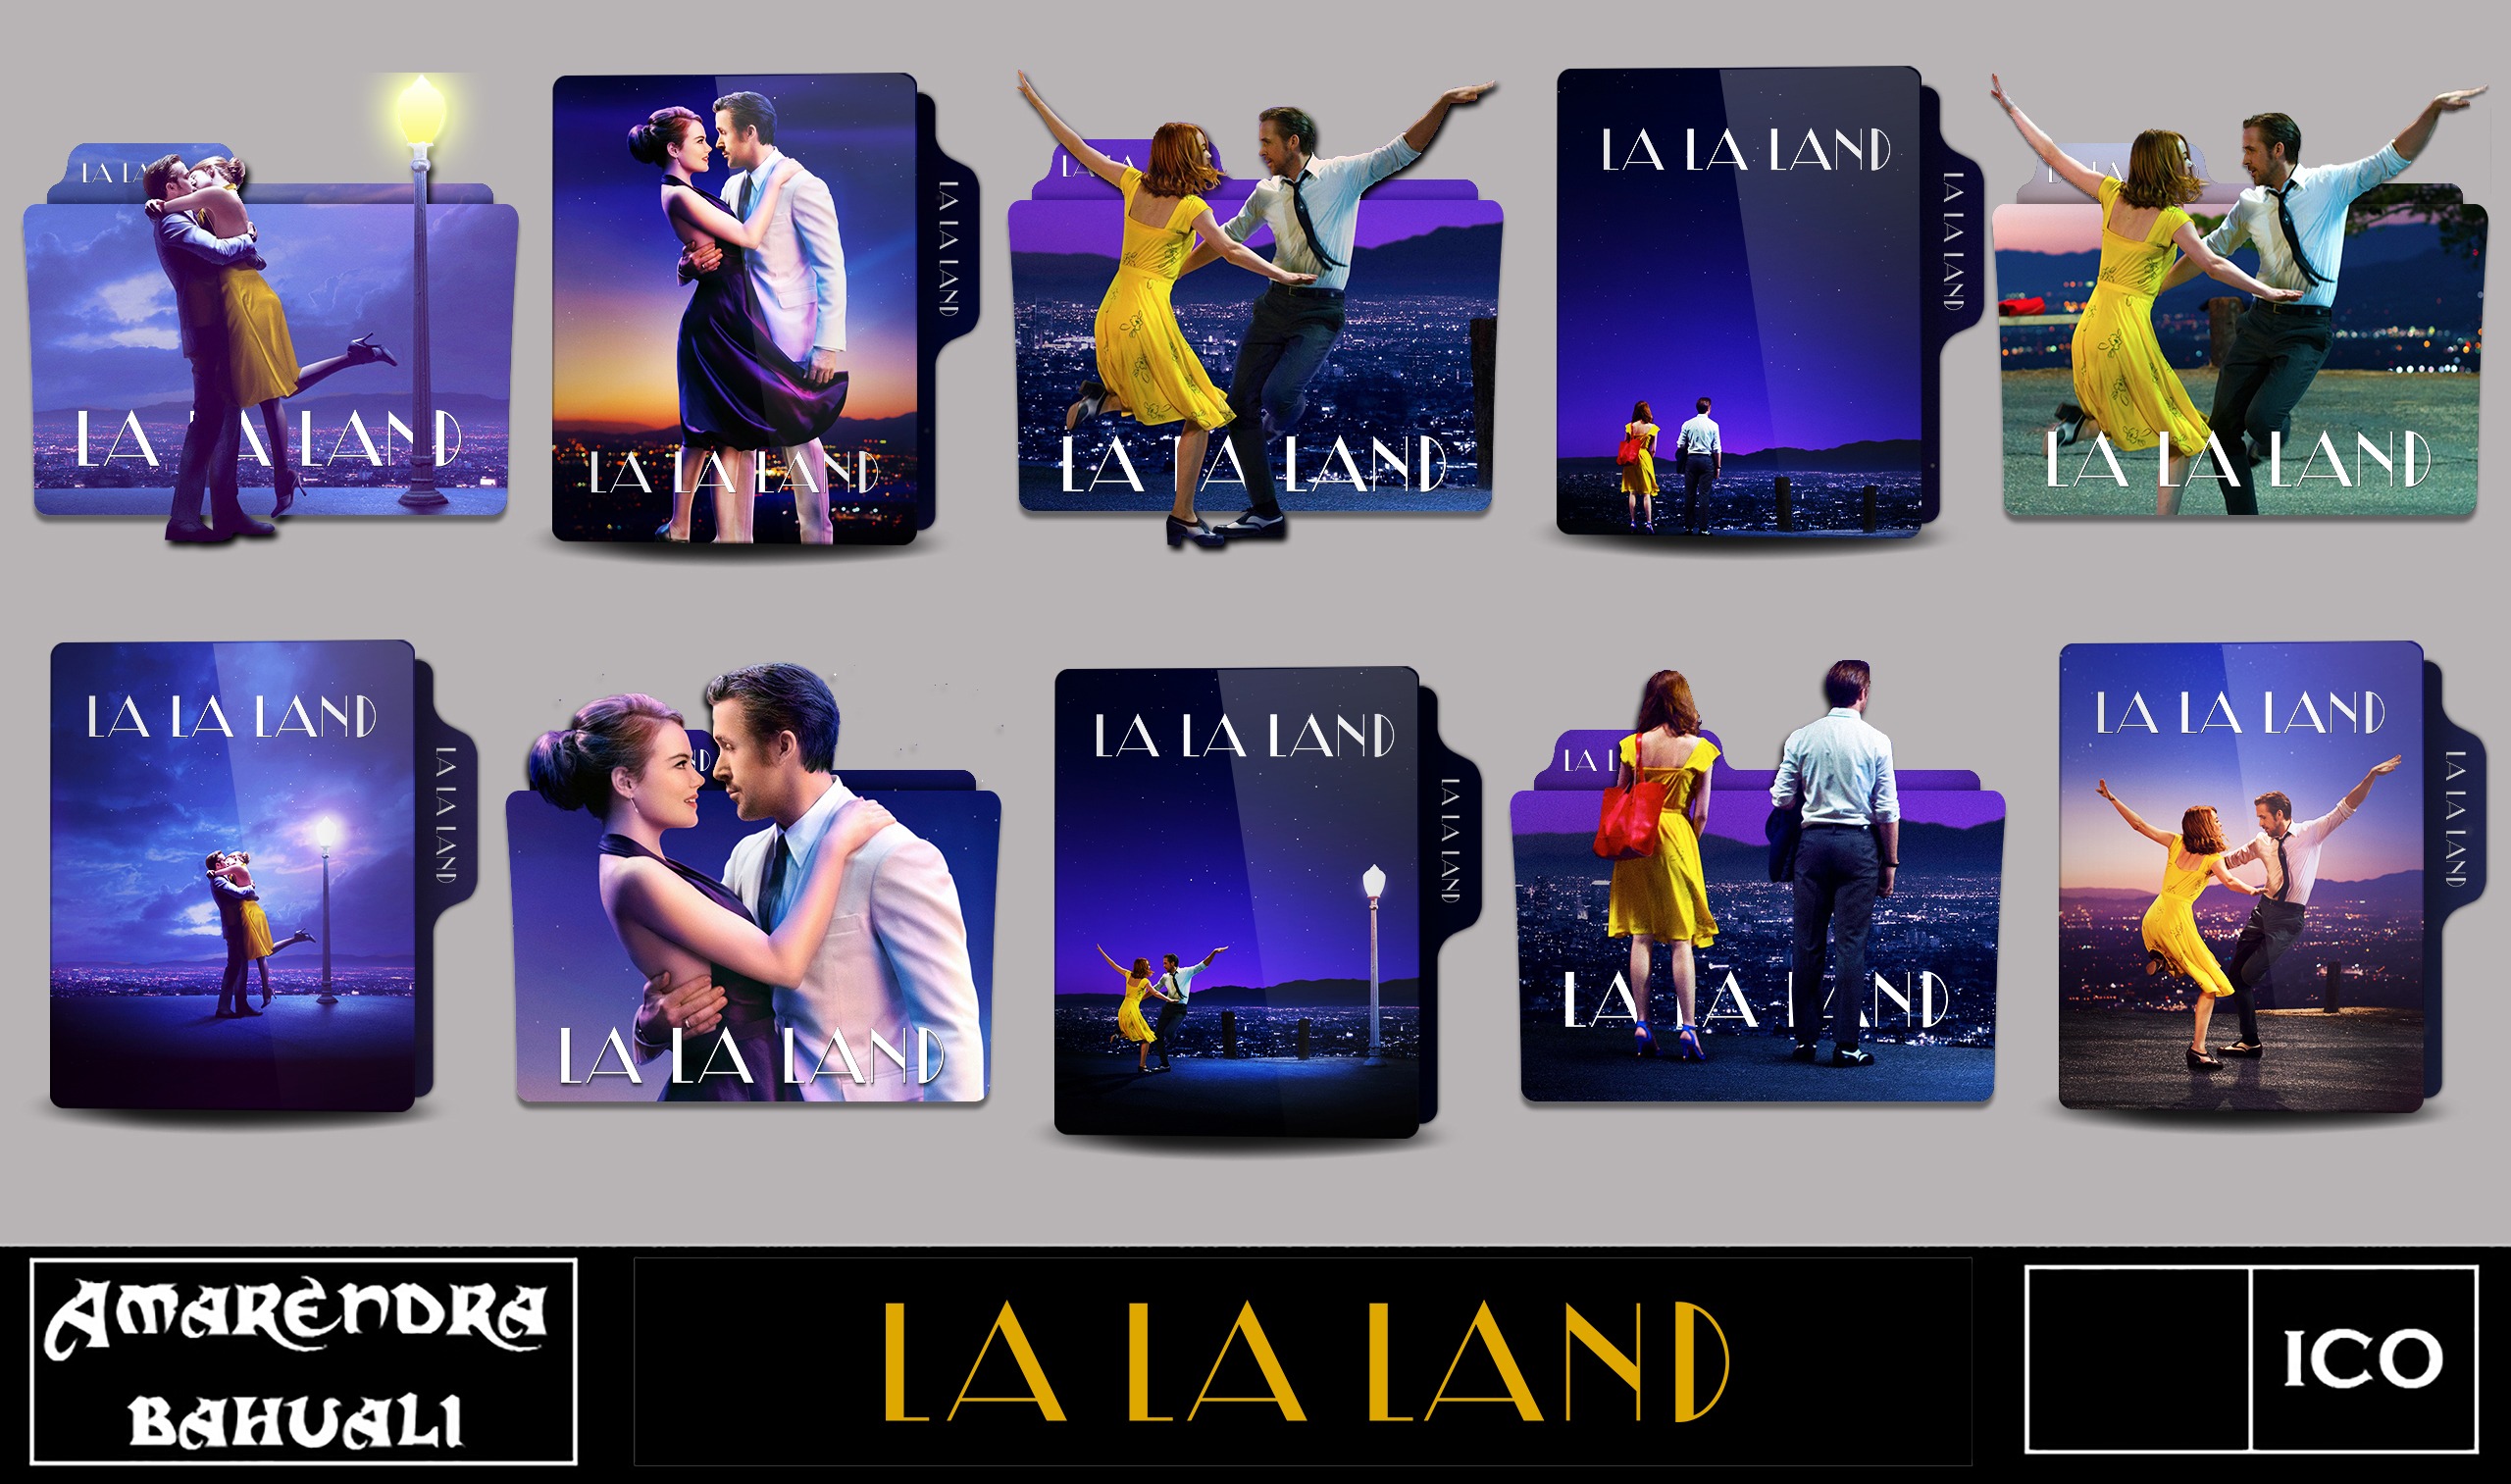 La La Land 2016 Folder Icon By G0d 0f Thund3r On Deviantart